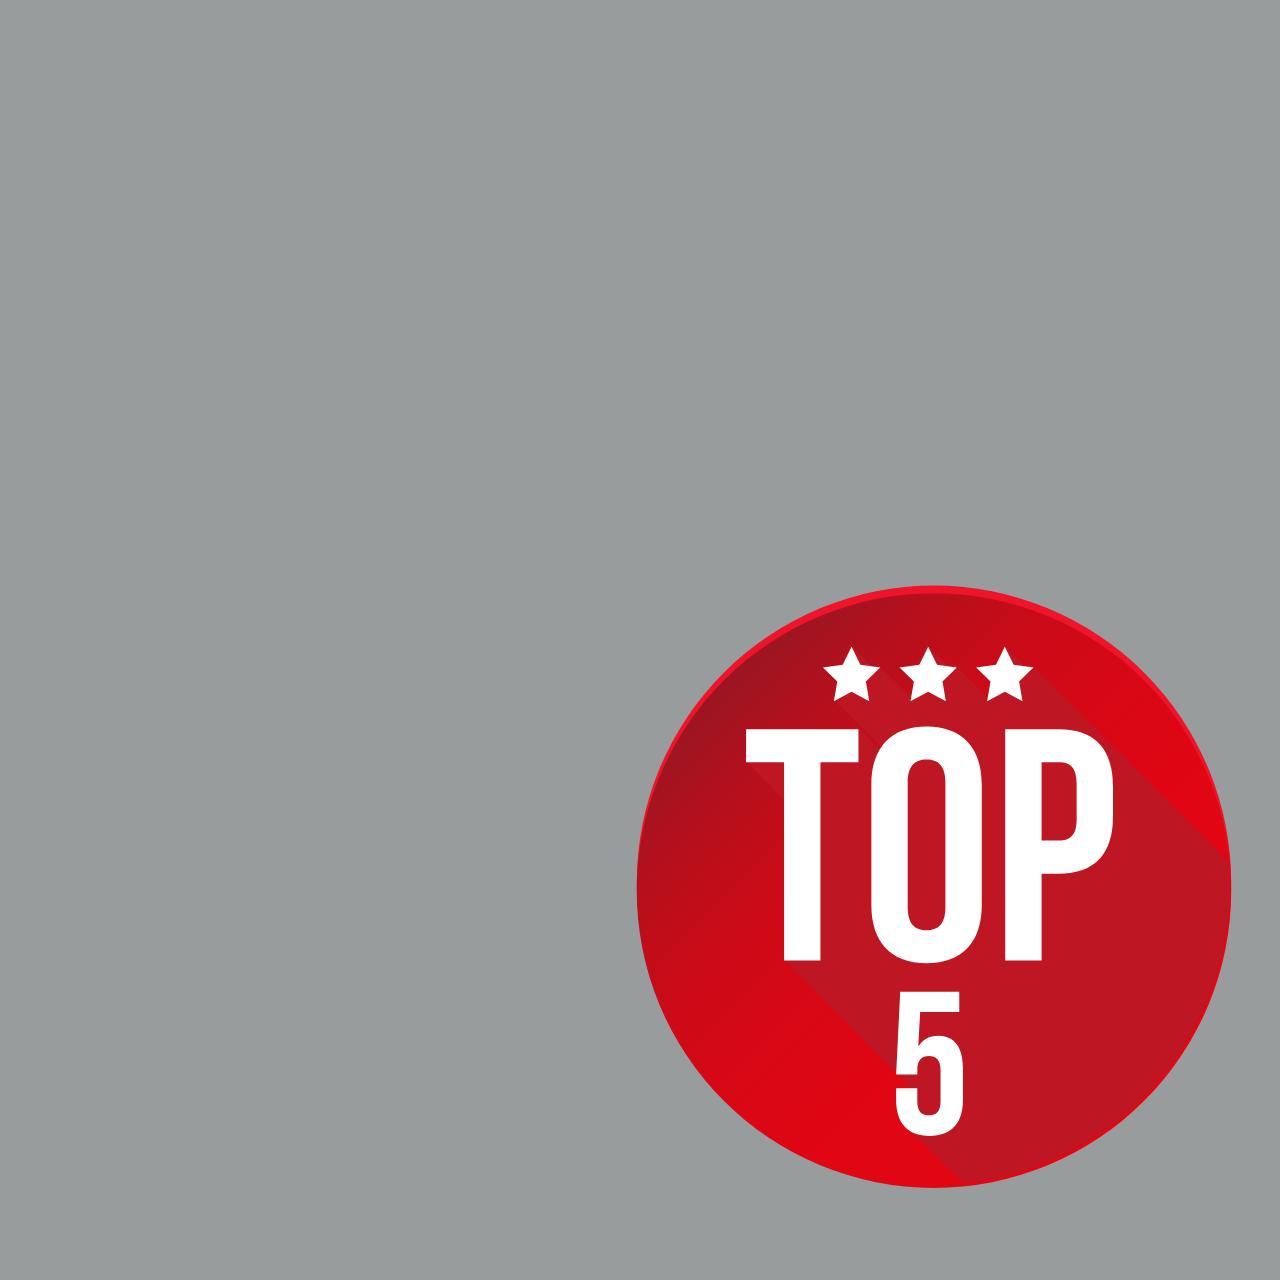 Top 5 Branding Books